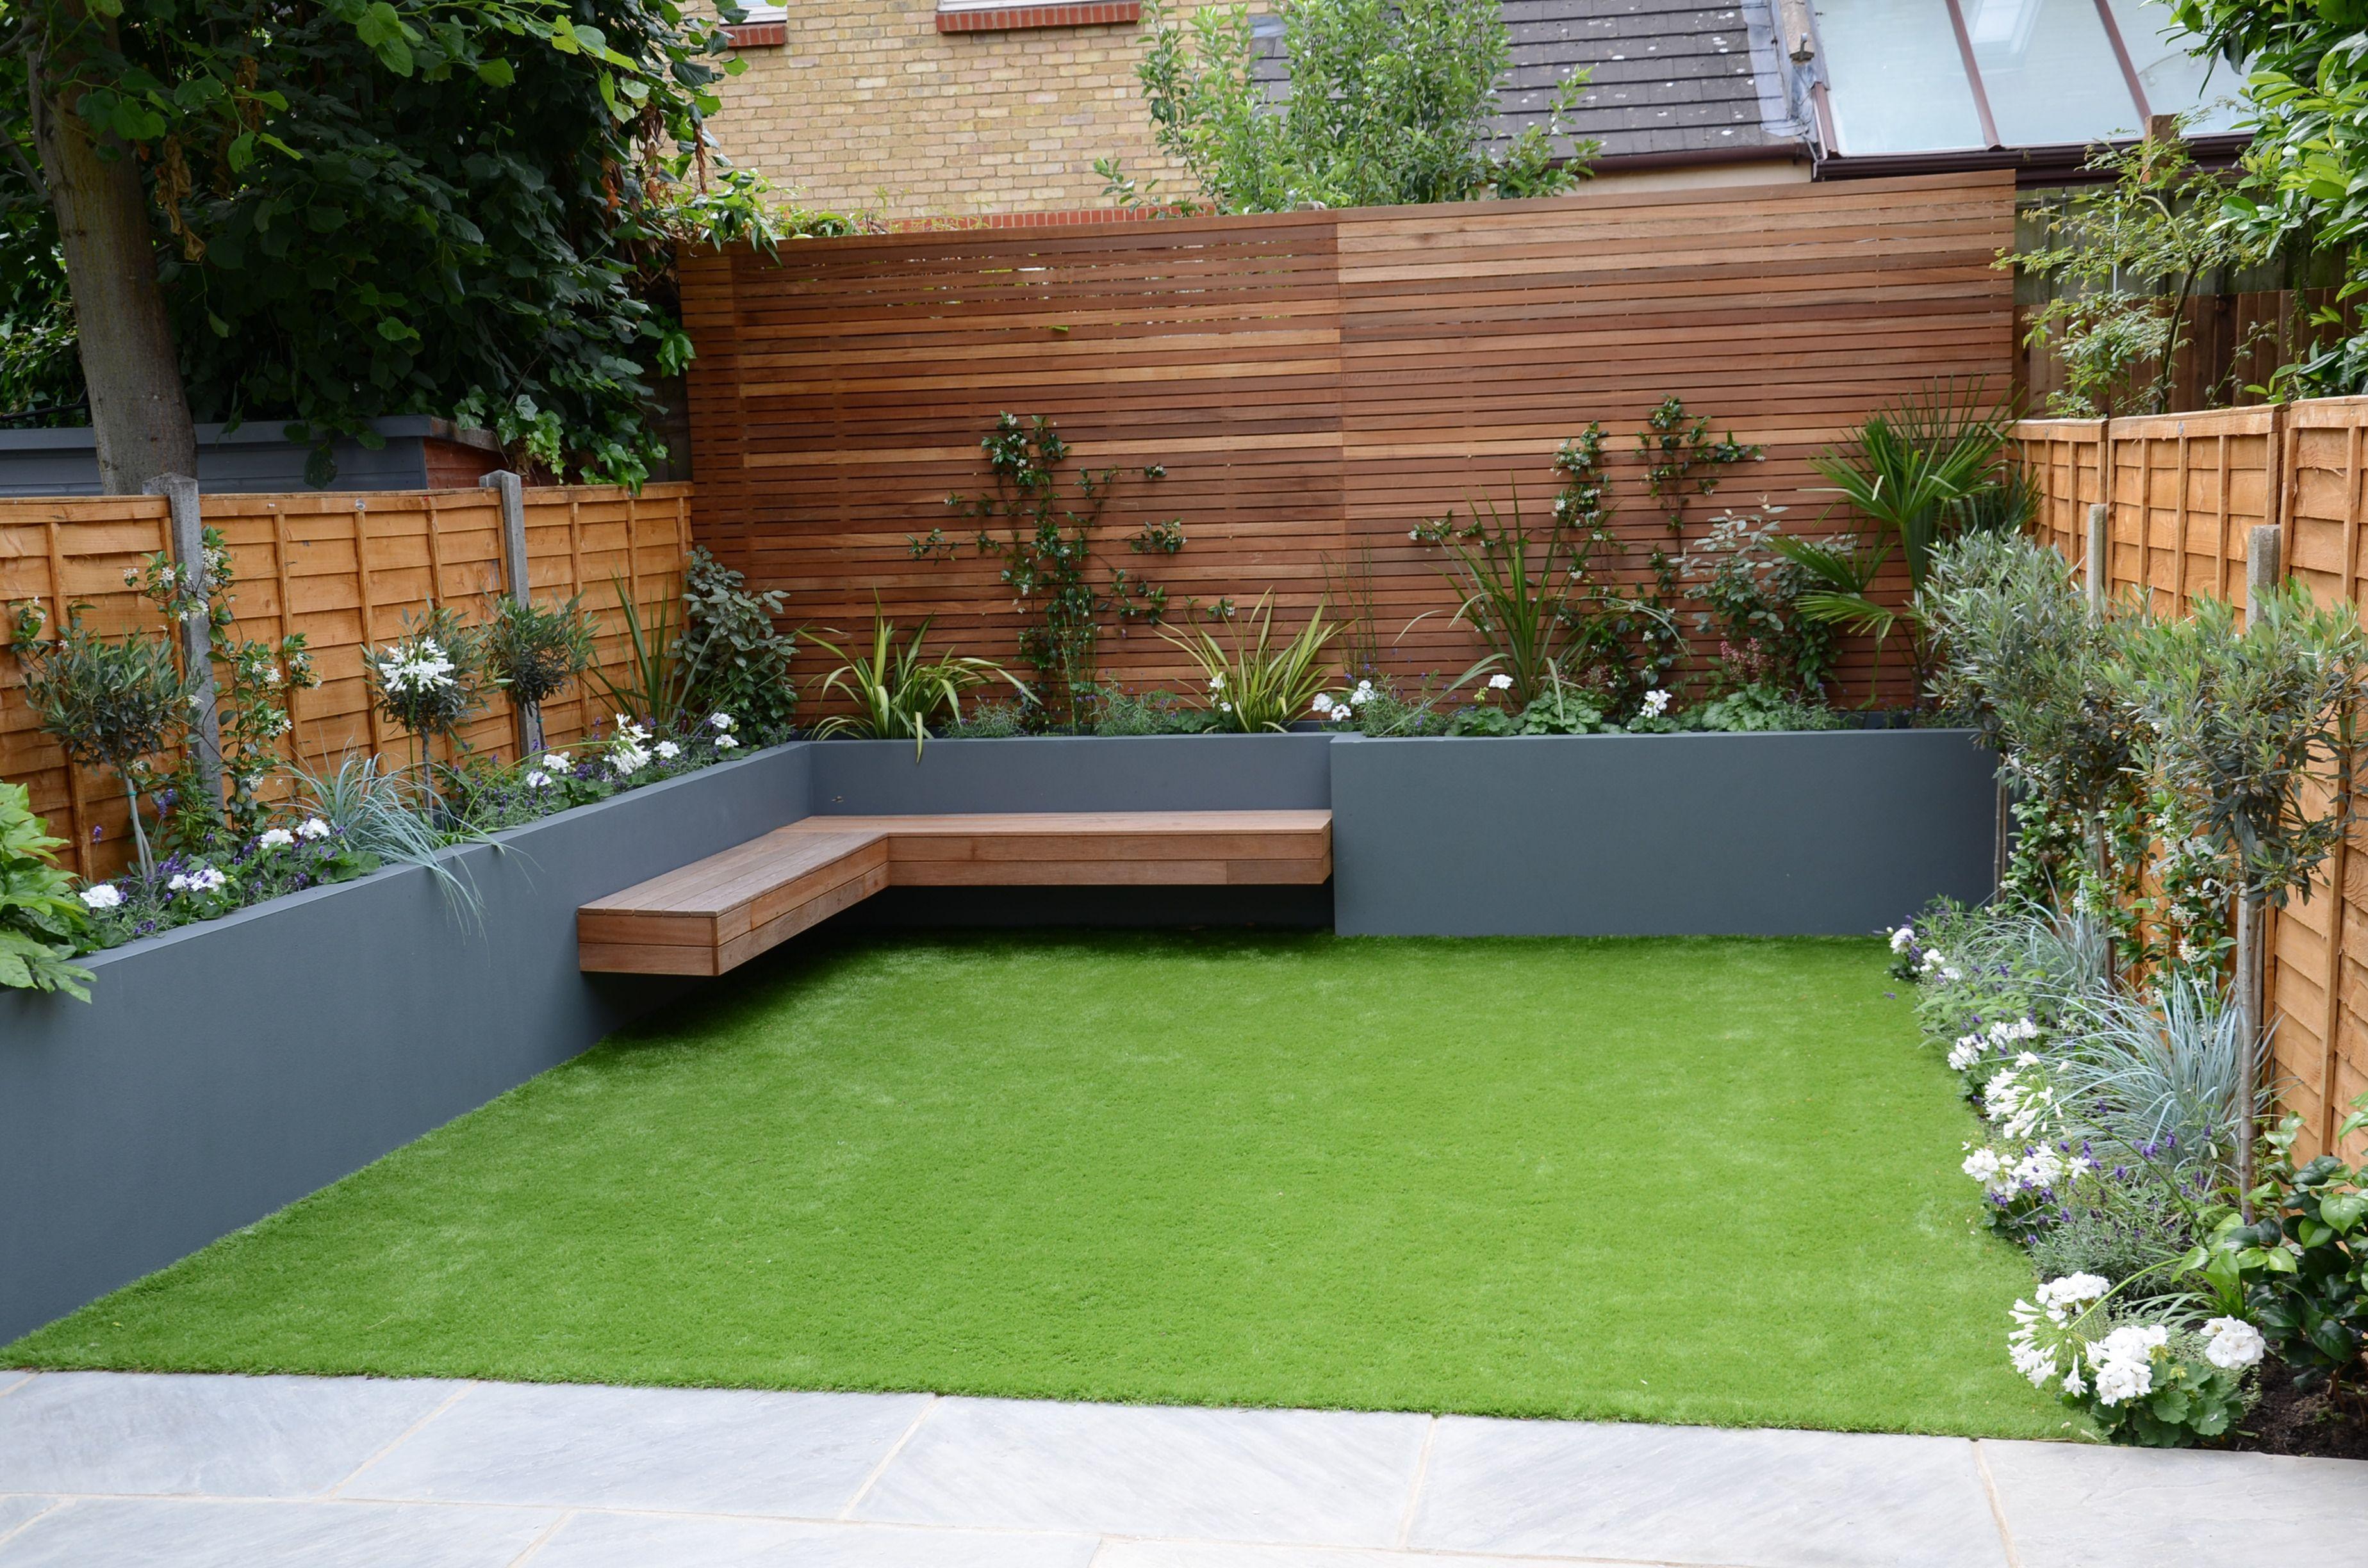 The Best 10 Best Small Garden Design Ideas For A Refreshing Home Atmosphere Gardens Although Urban Garden Design Modern Garden Design Small Backyard Gardens